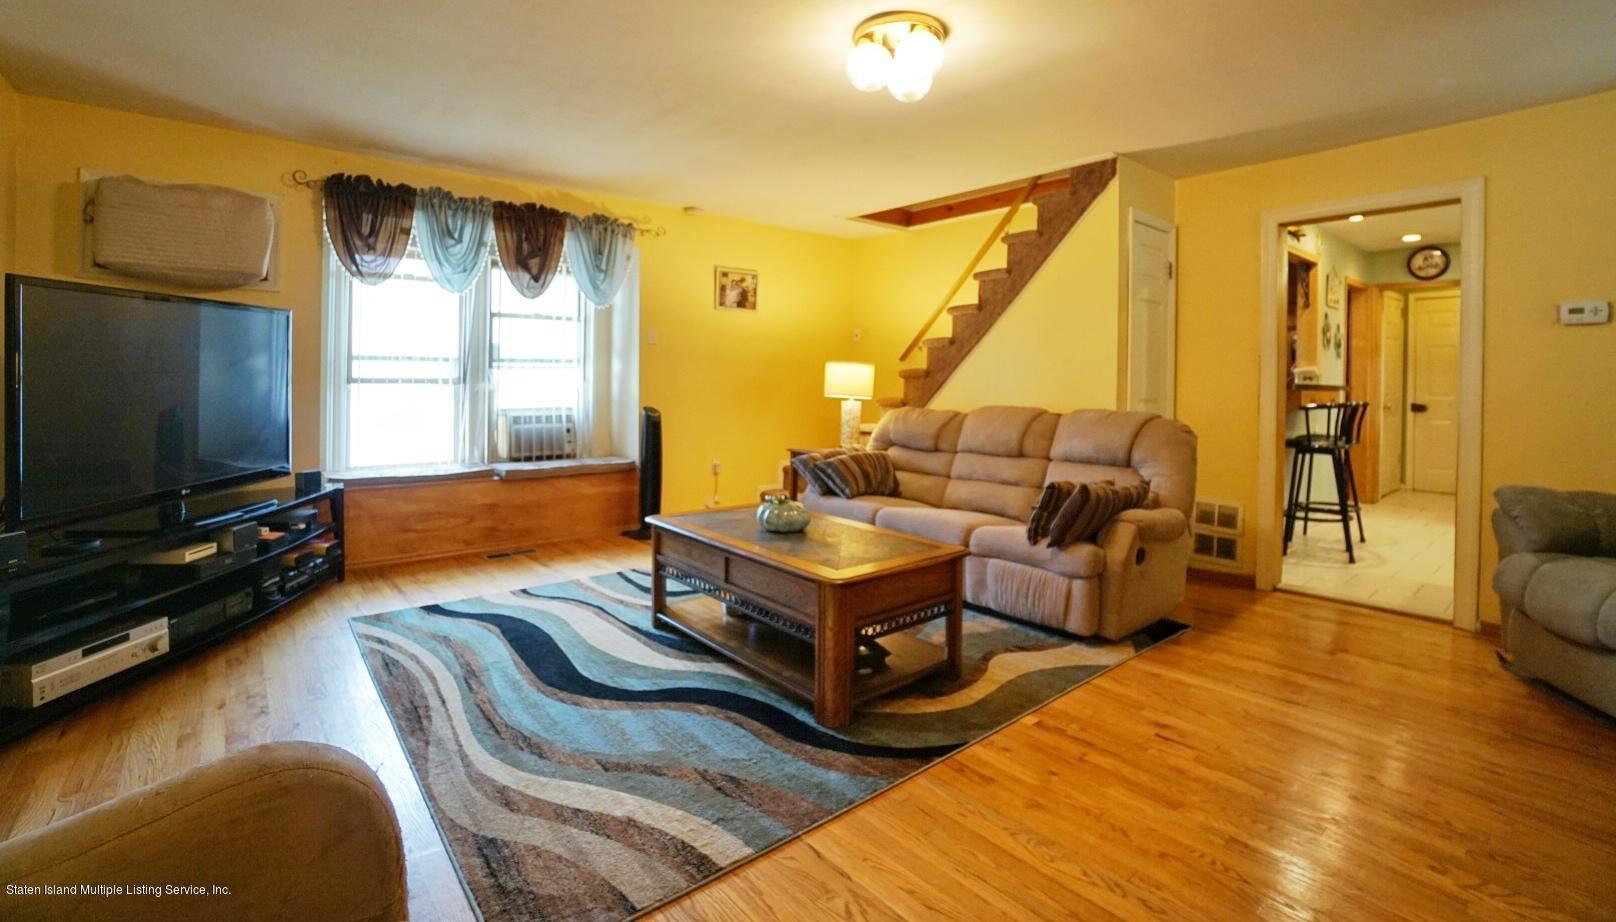 Single Family - Detached 42-44 Oceanic Avenue  Staten Island, NY 10312, MLS-1132674-3